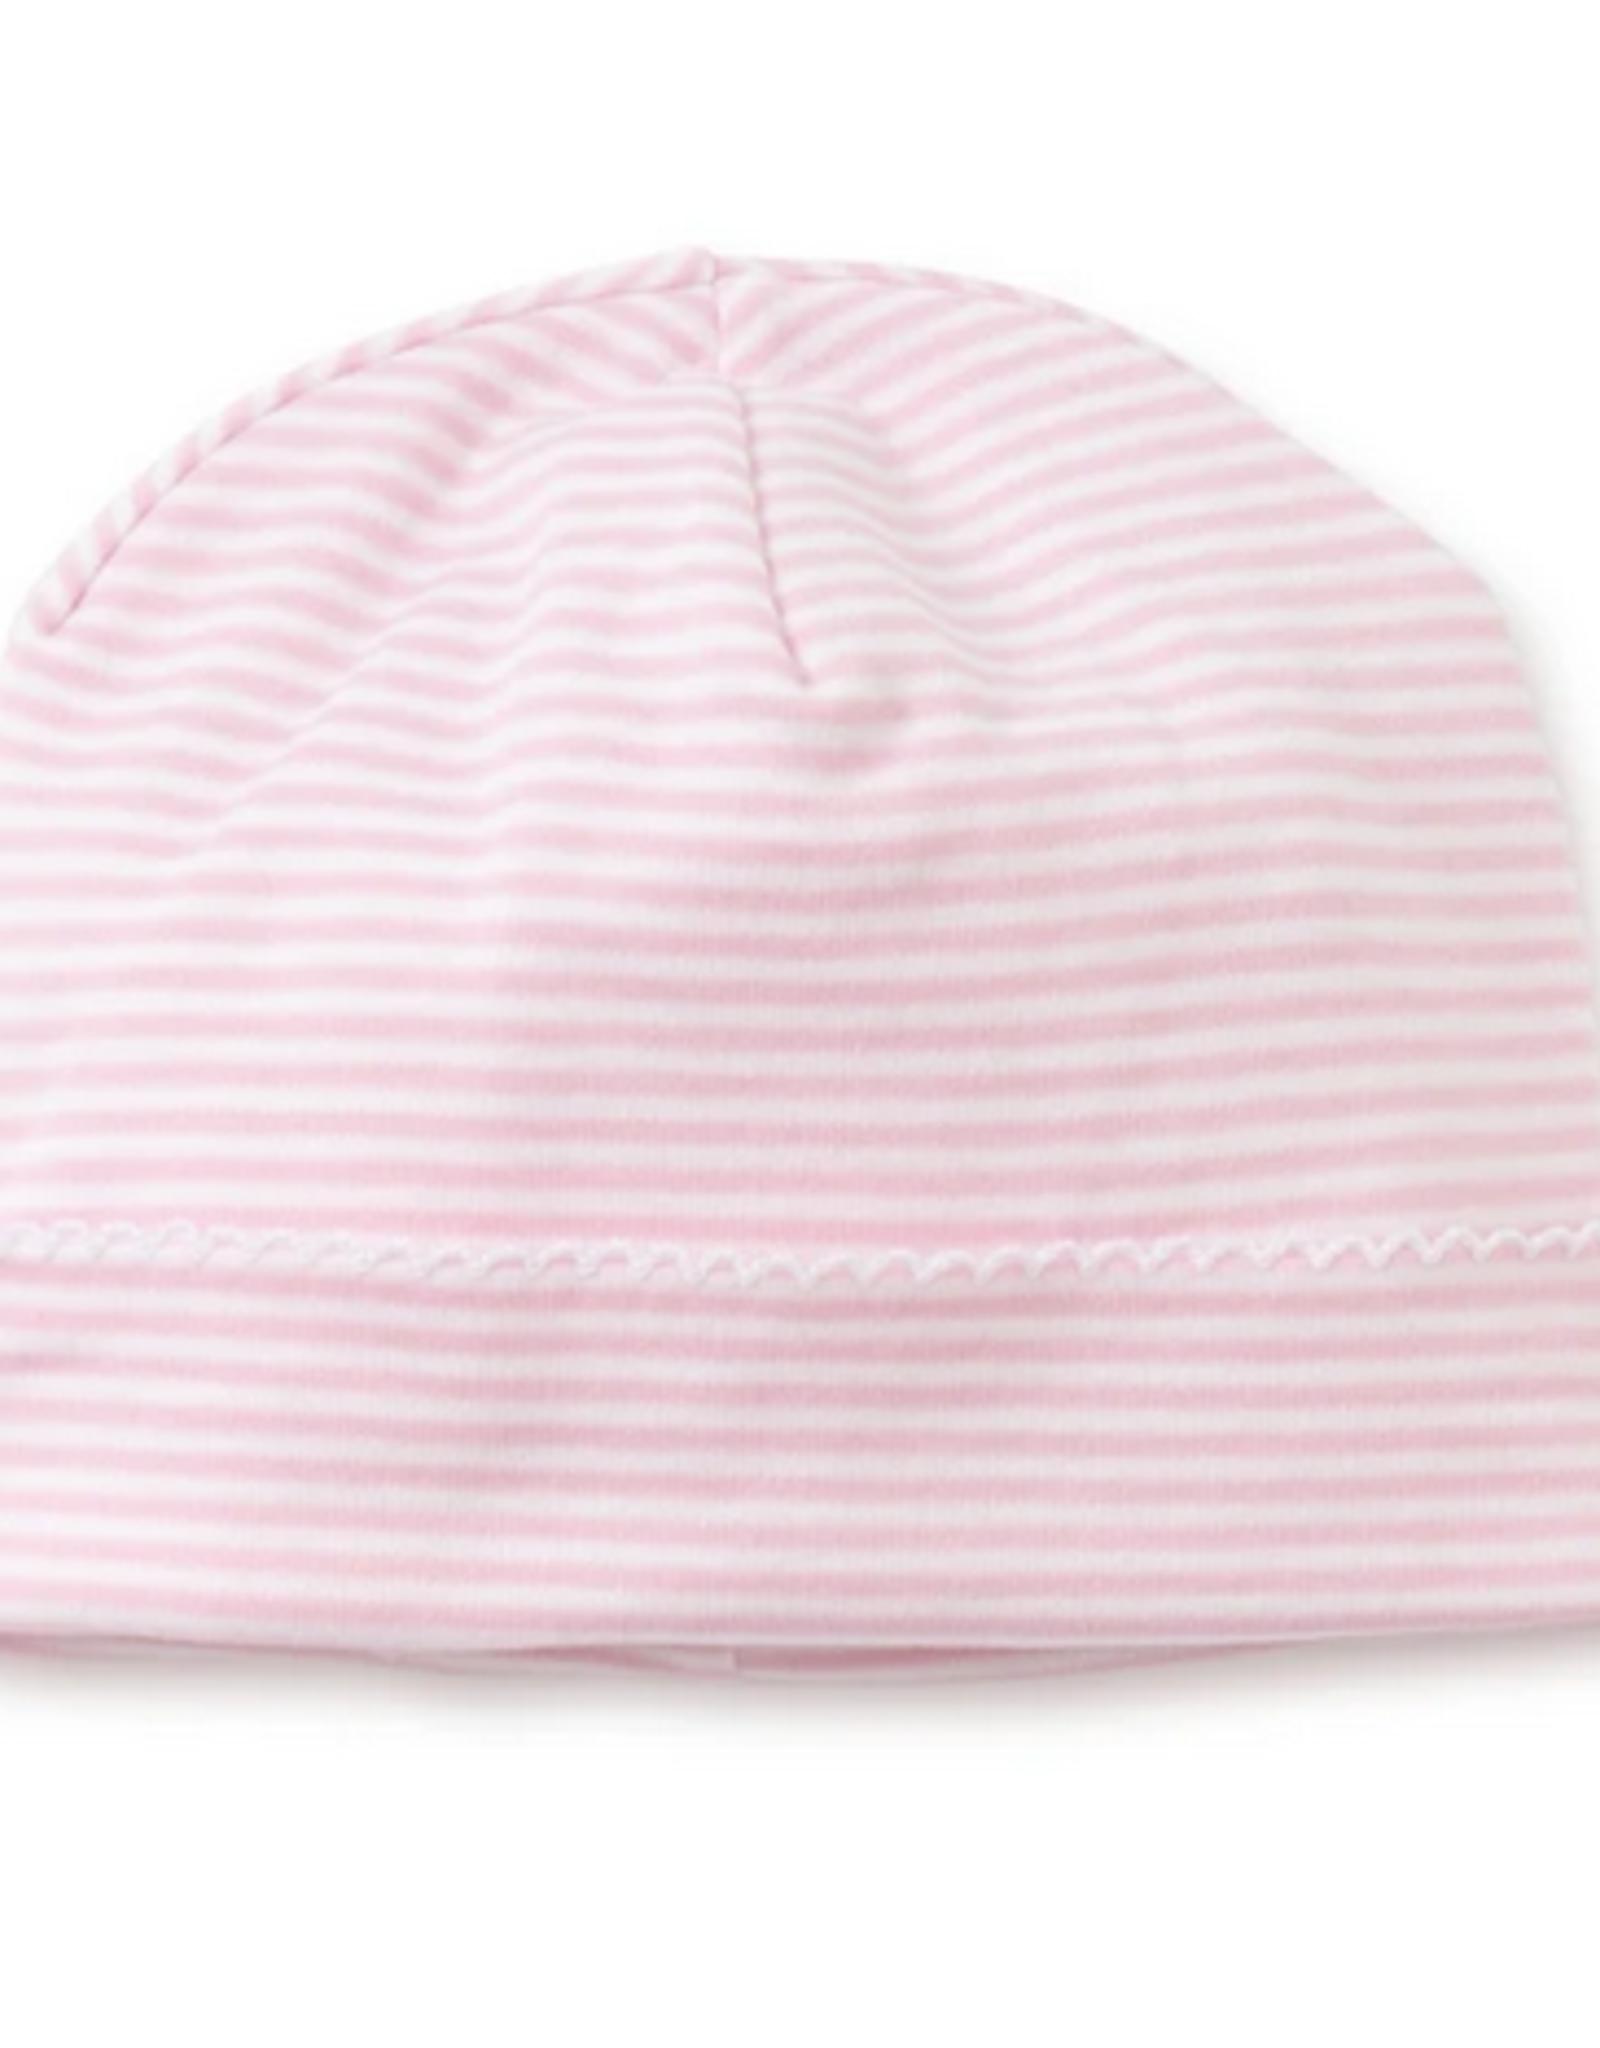 Kissy Kissy Stripes pk hat